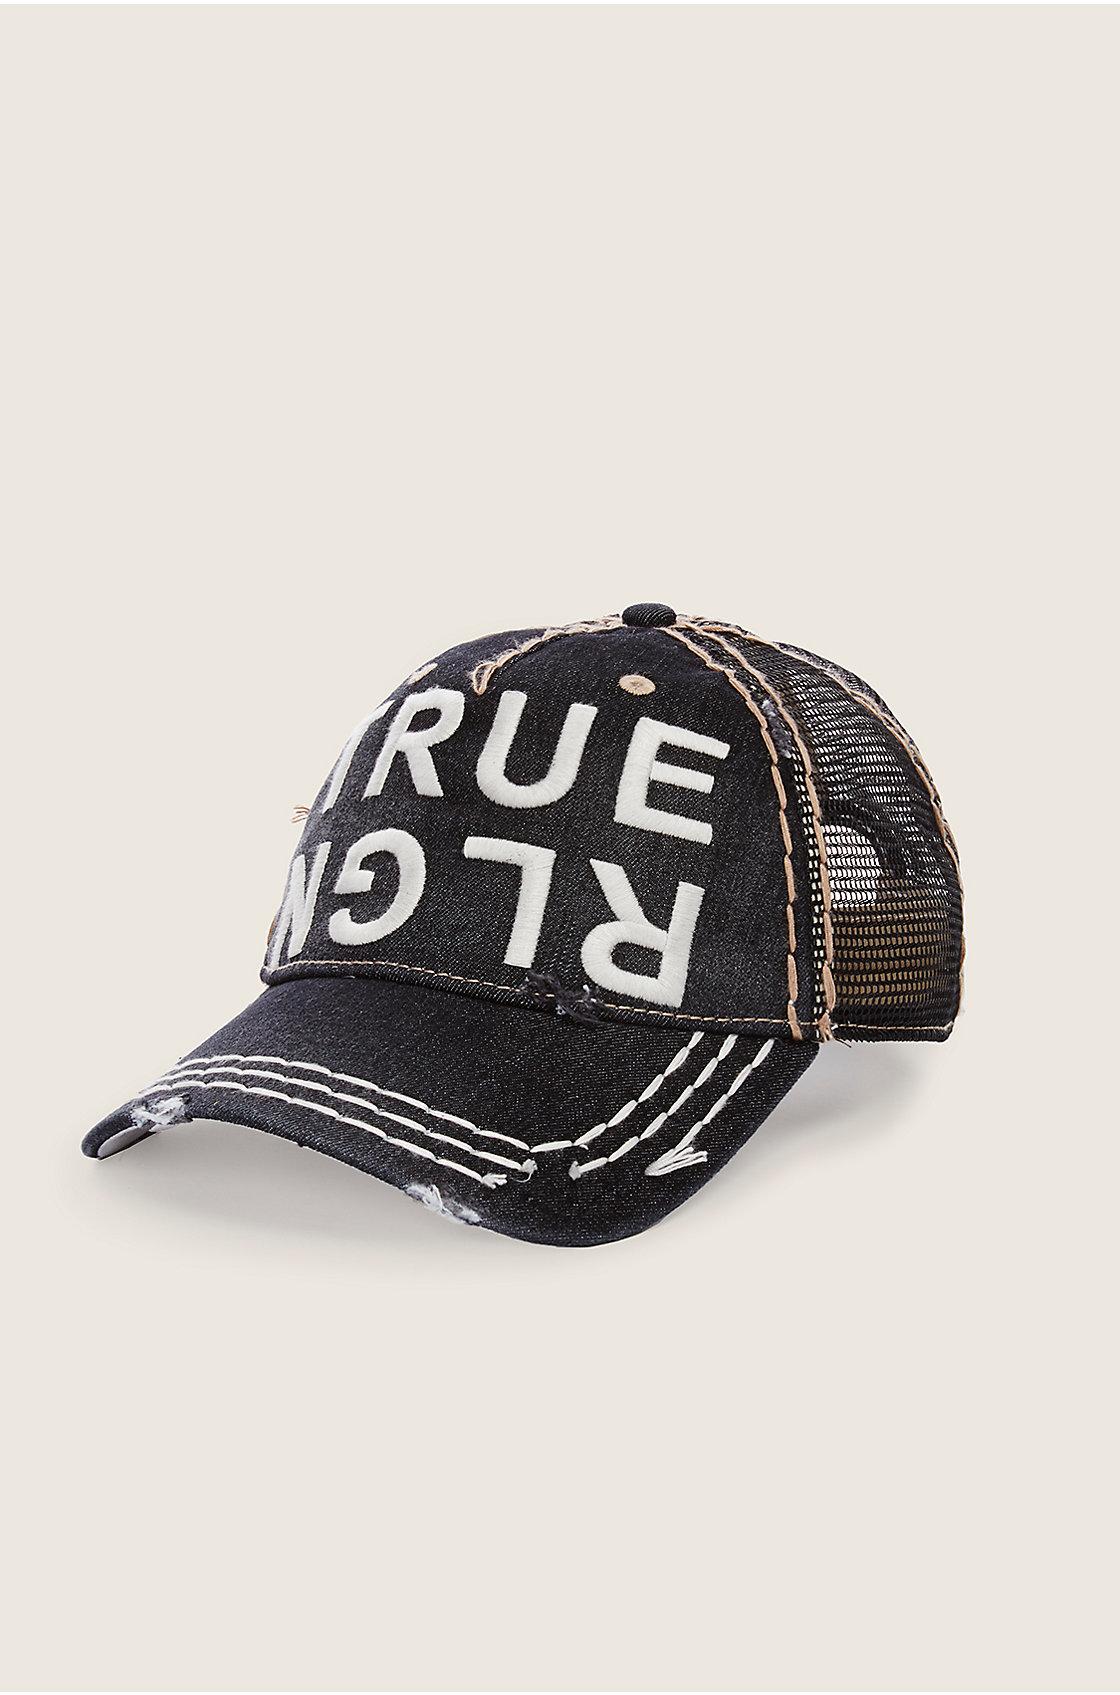 true religion tr denim baseball cap in black for men lyst. Black Bedroom Furniture Sets. Home Design Ideas